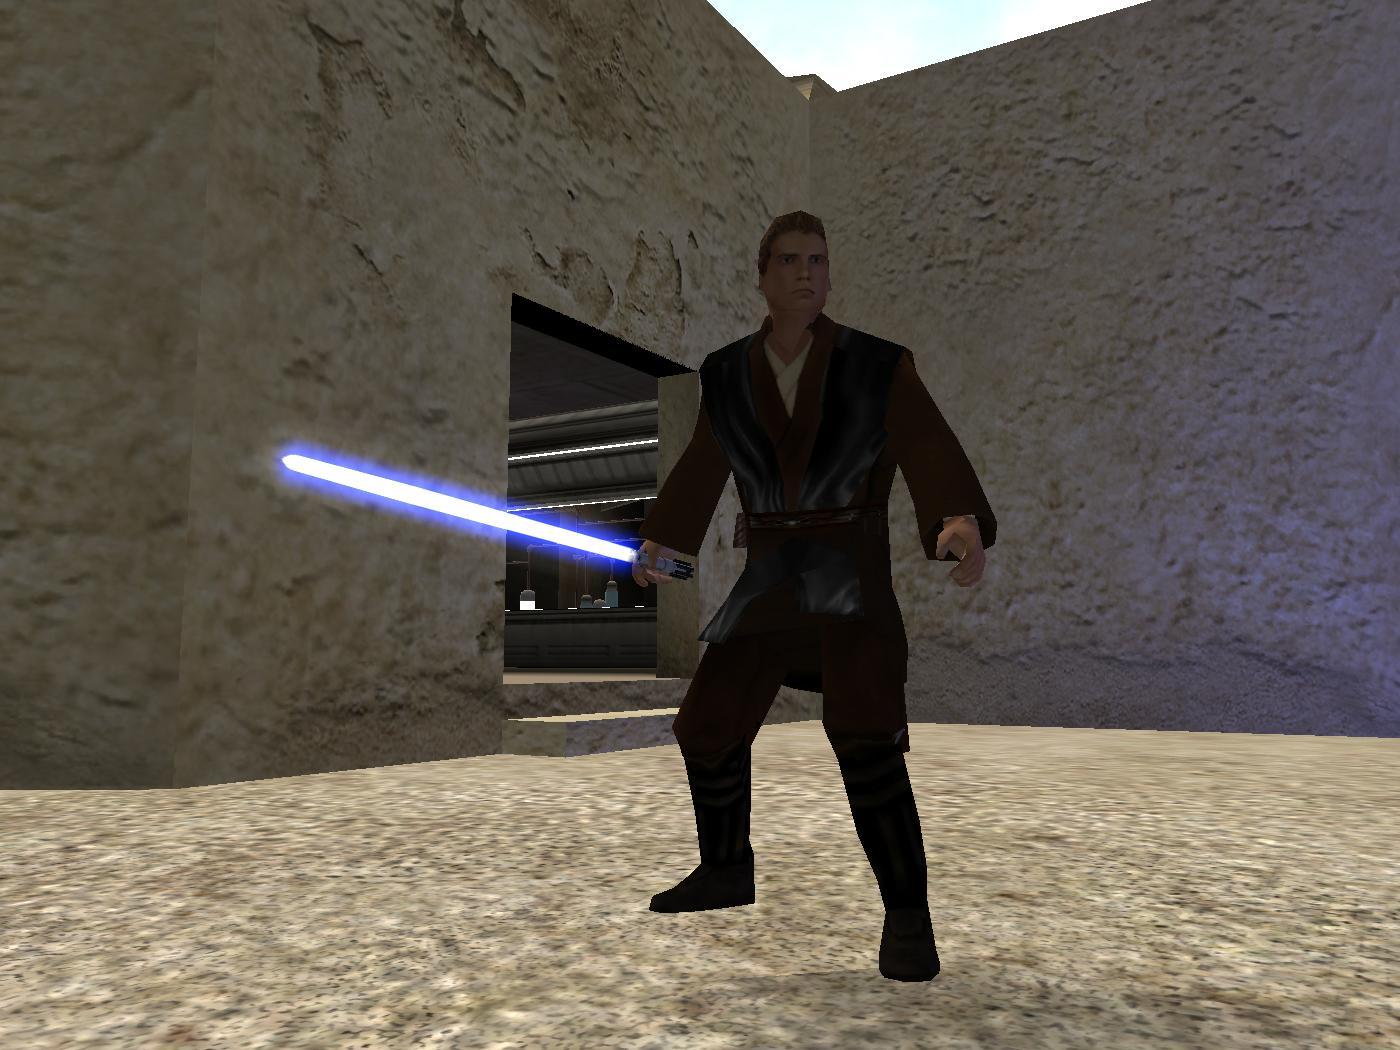 Anakin Skywalker(2 Episode) image - TheJediStarkiller - Mod DB